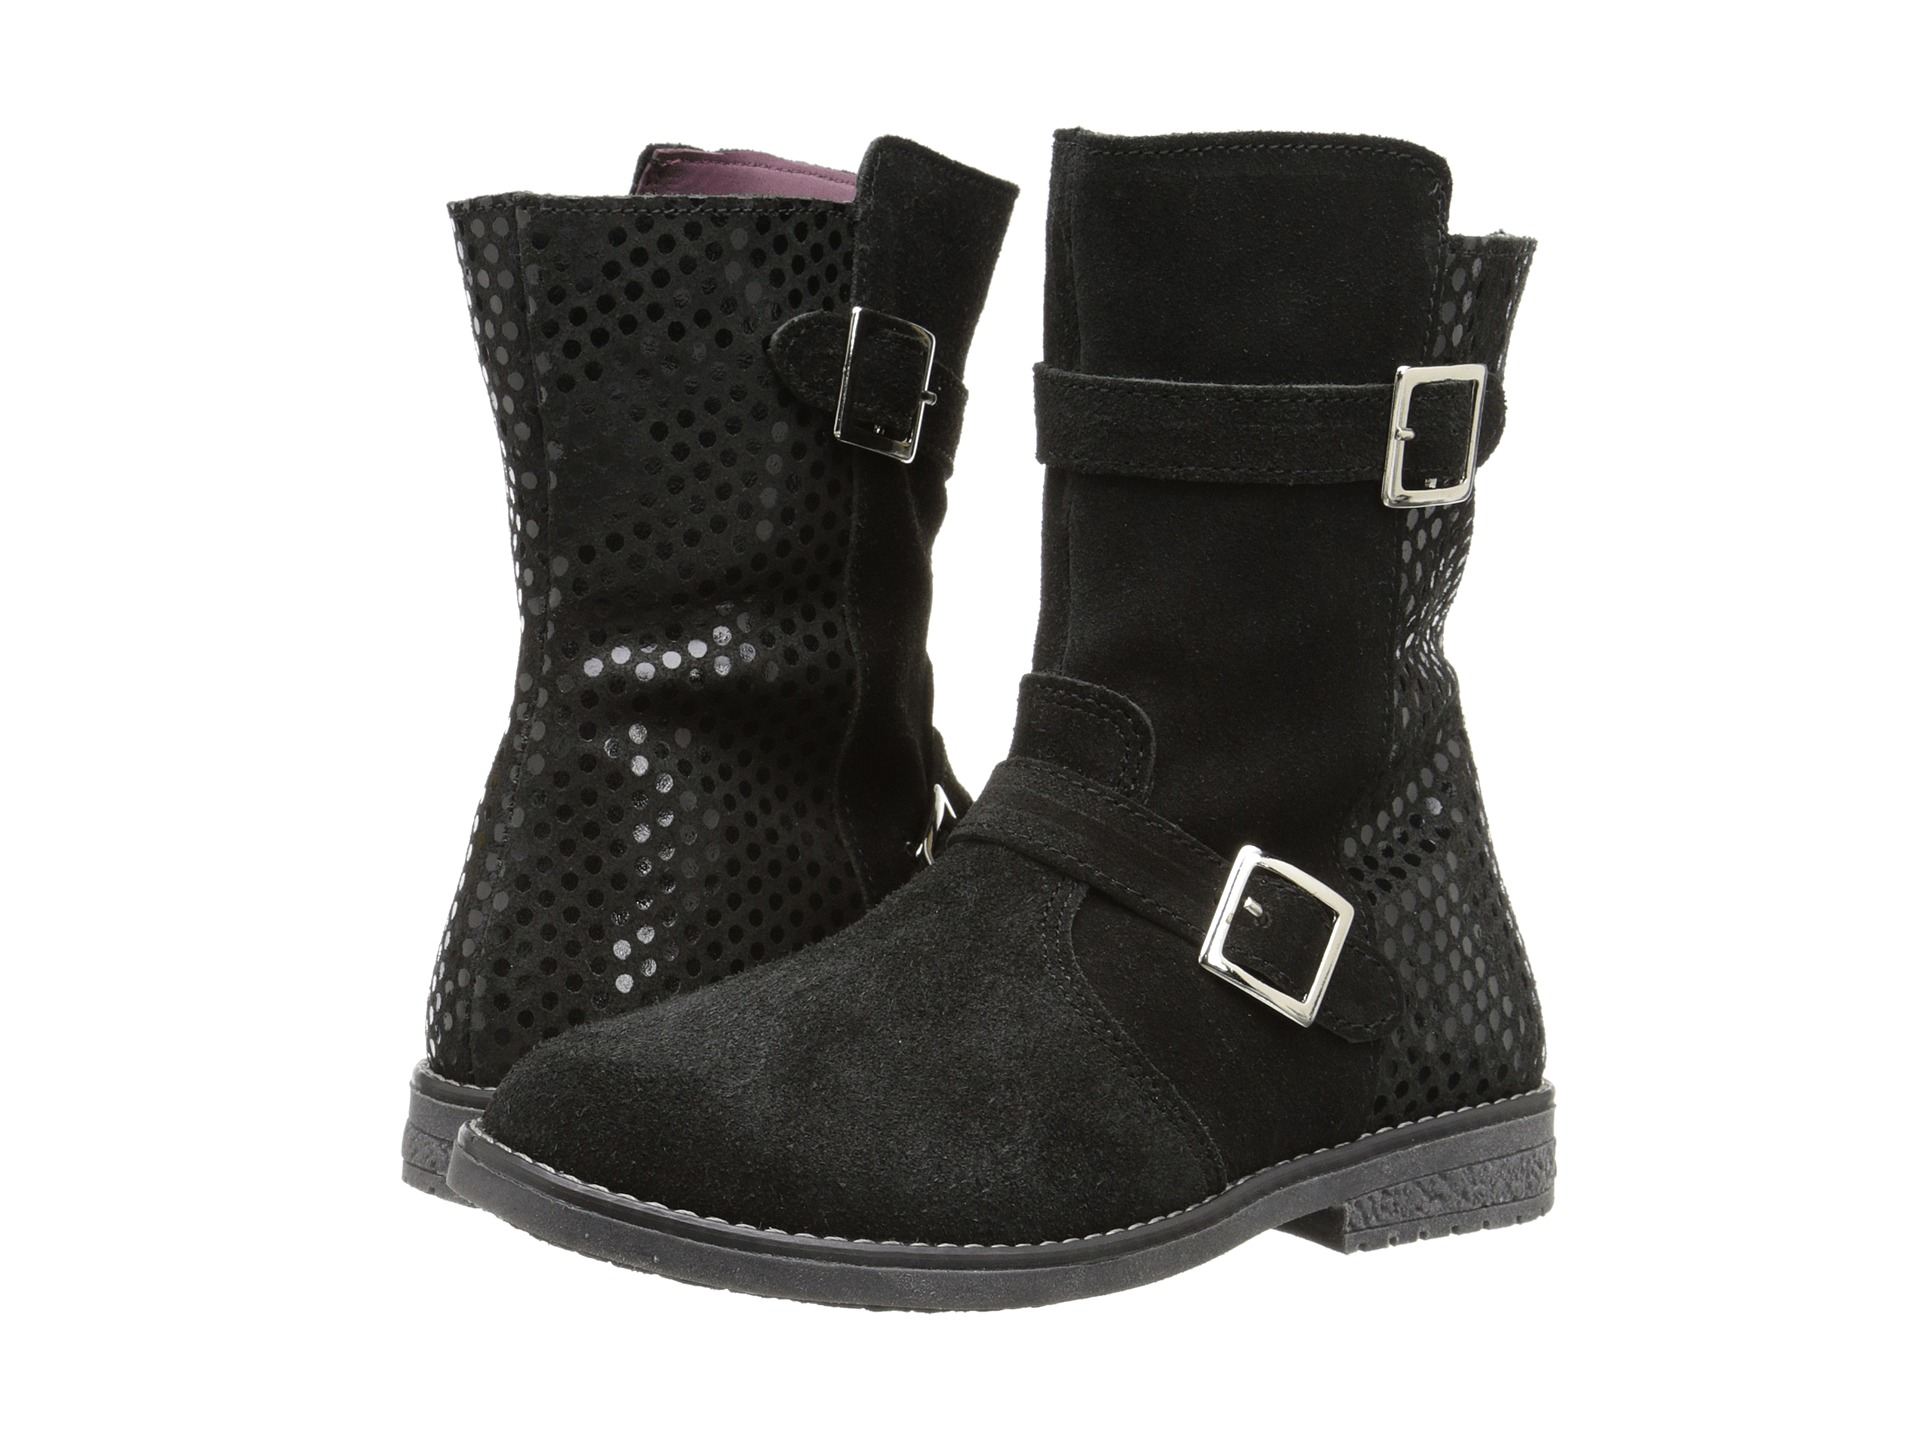 kids boots at 6pm.com